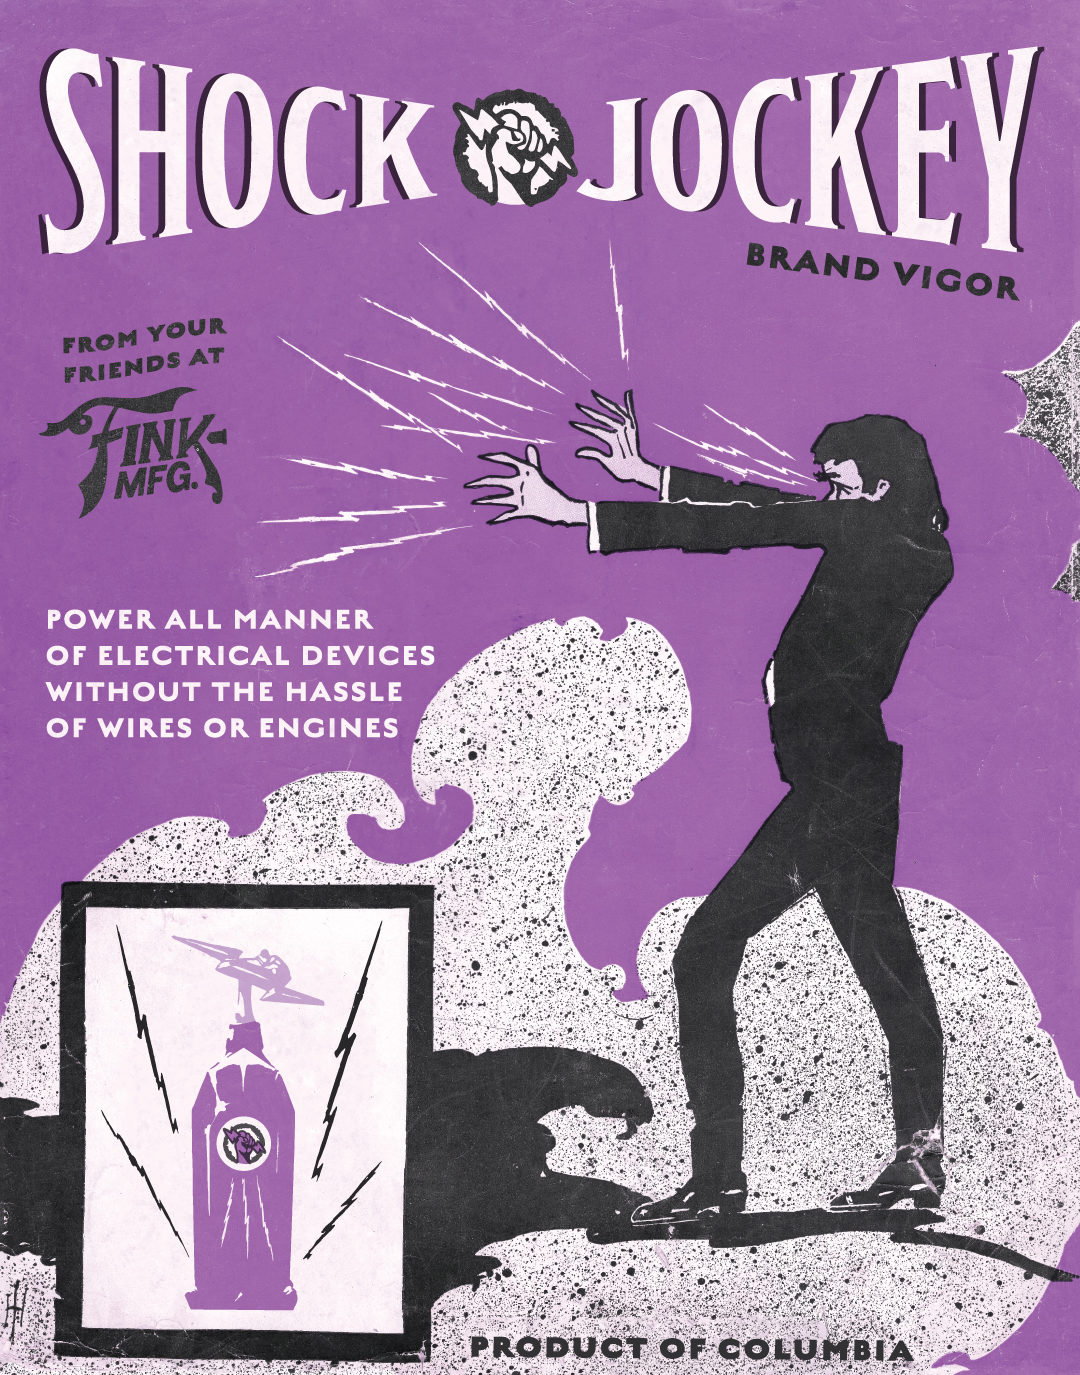 Shock Jockey Poster